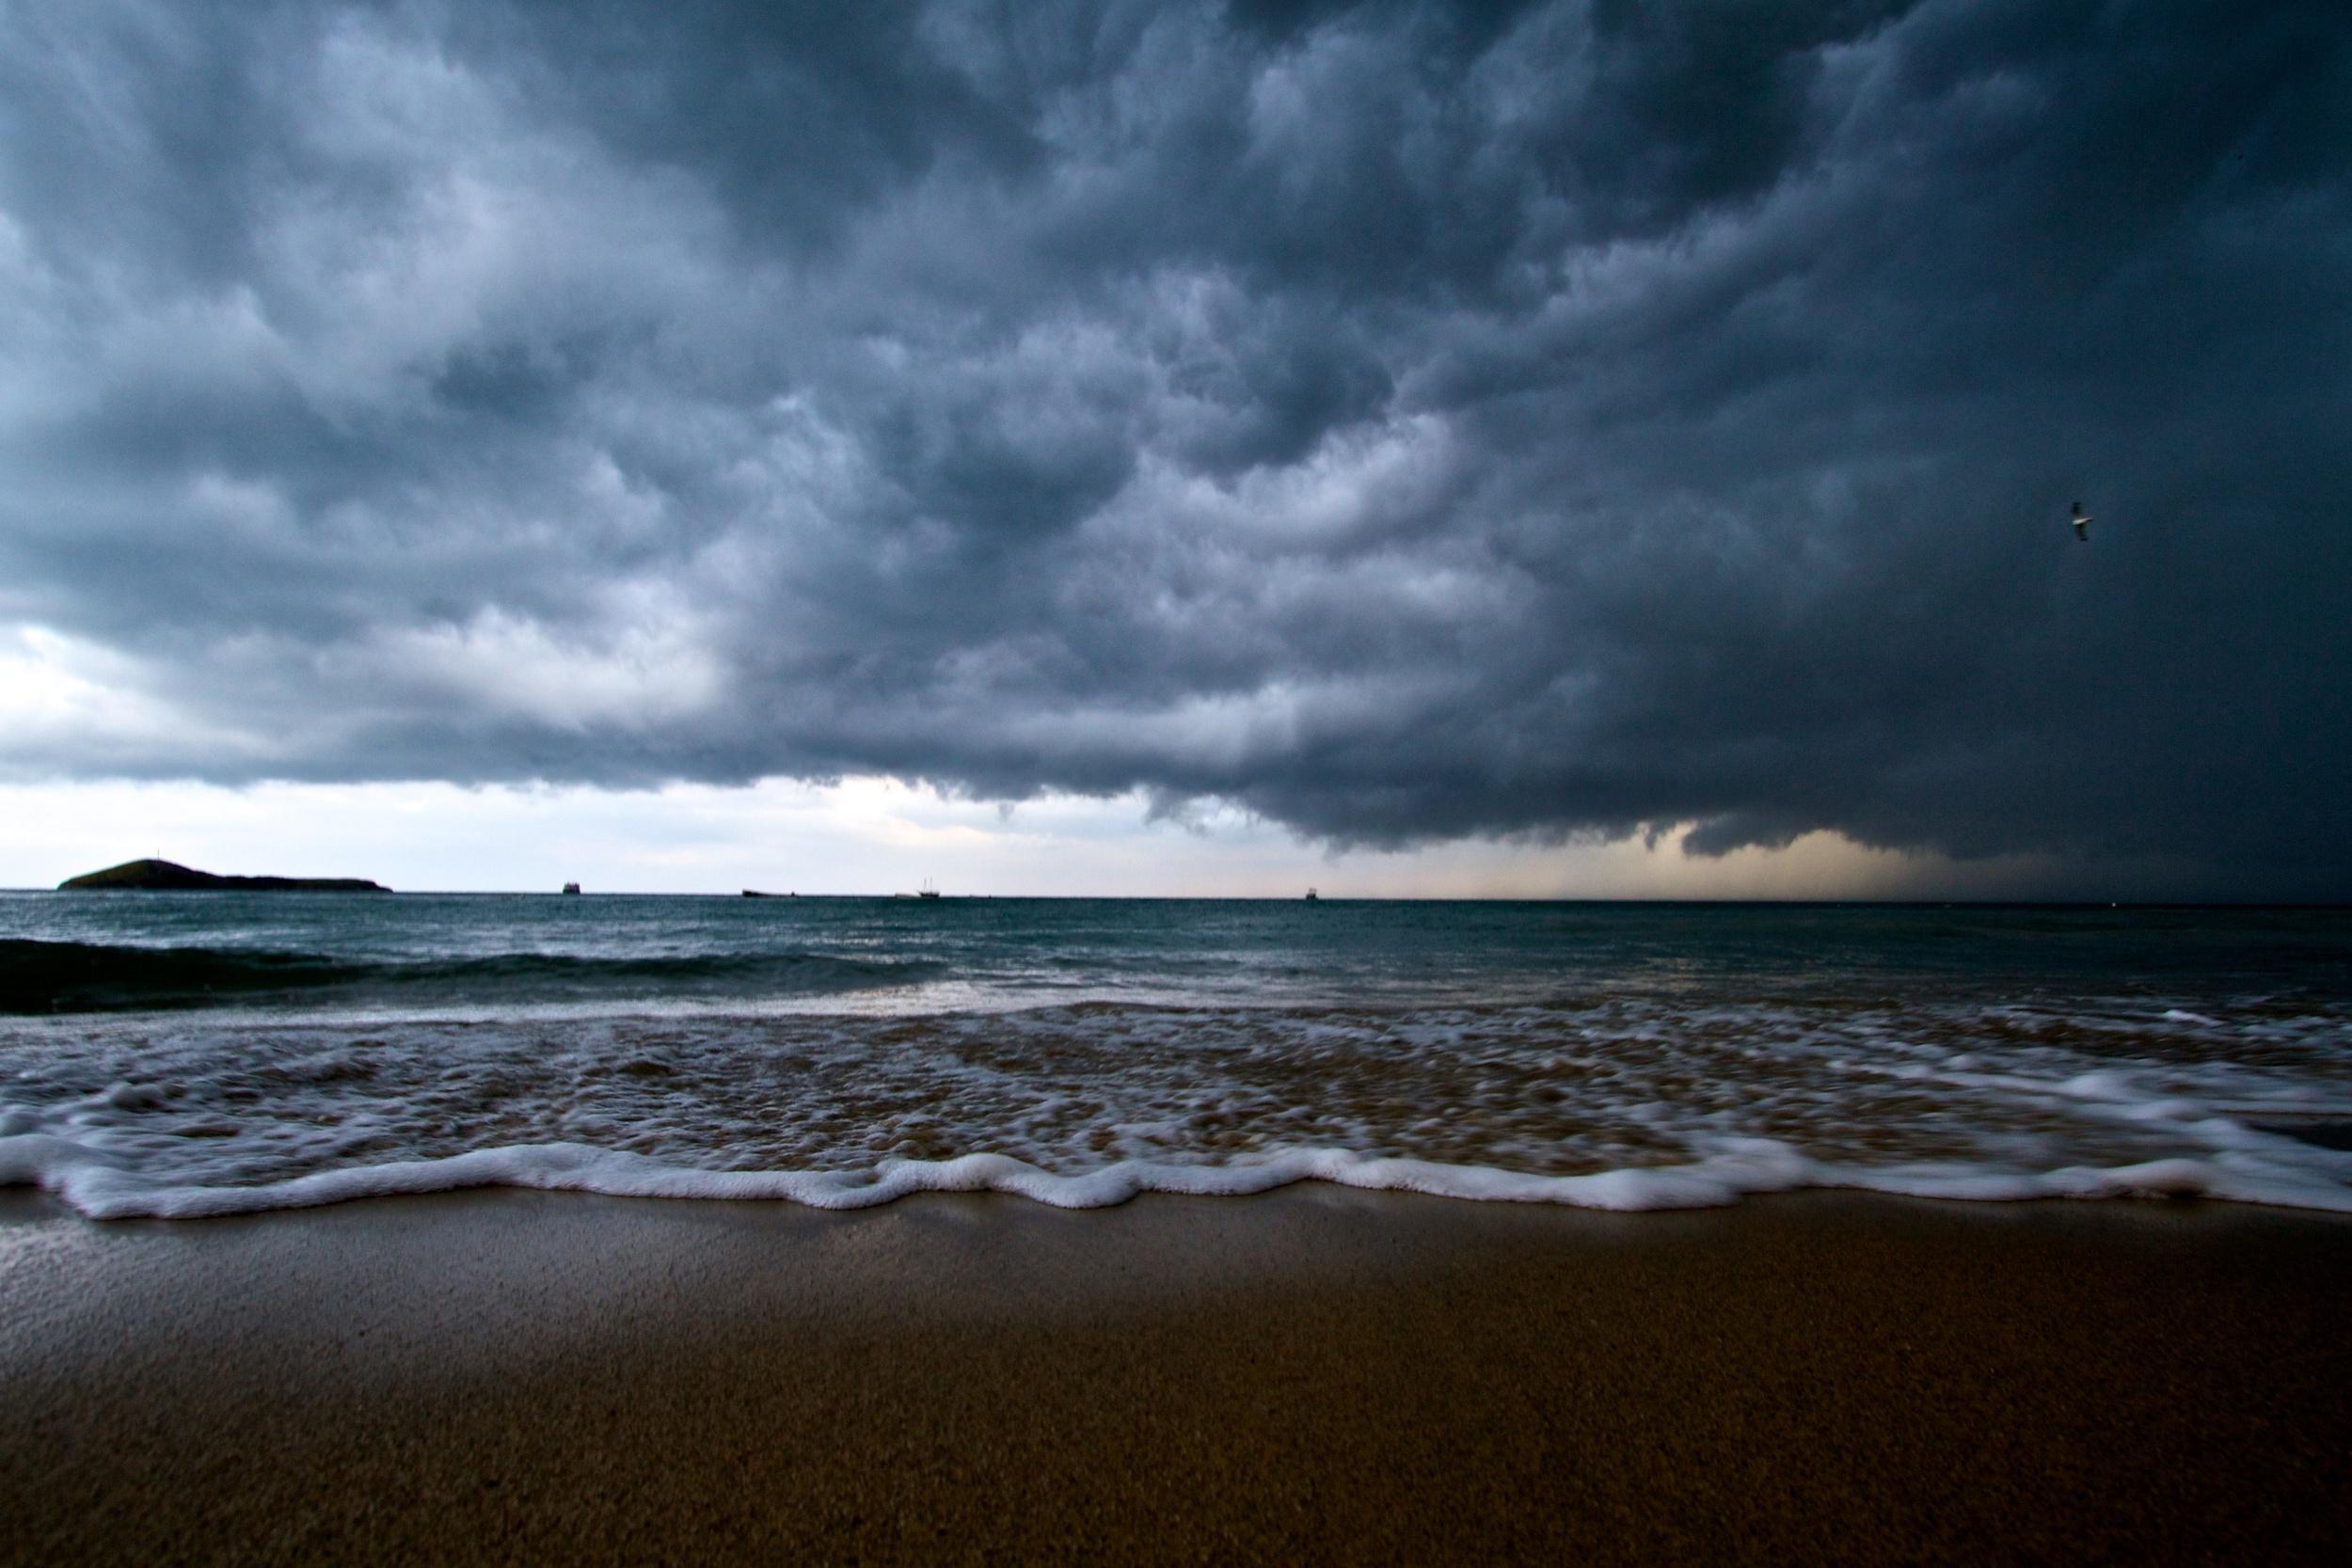 2012-12-27 at 14-48-09 Beach, Dark, Ocean, Panama, Seascape, Sky, Storm, Threatening.jpg